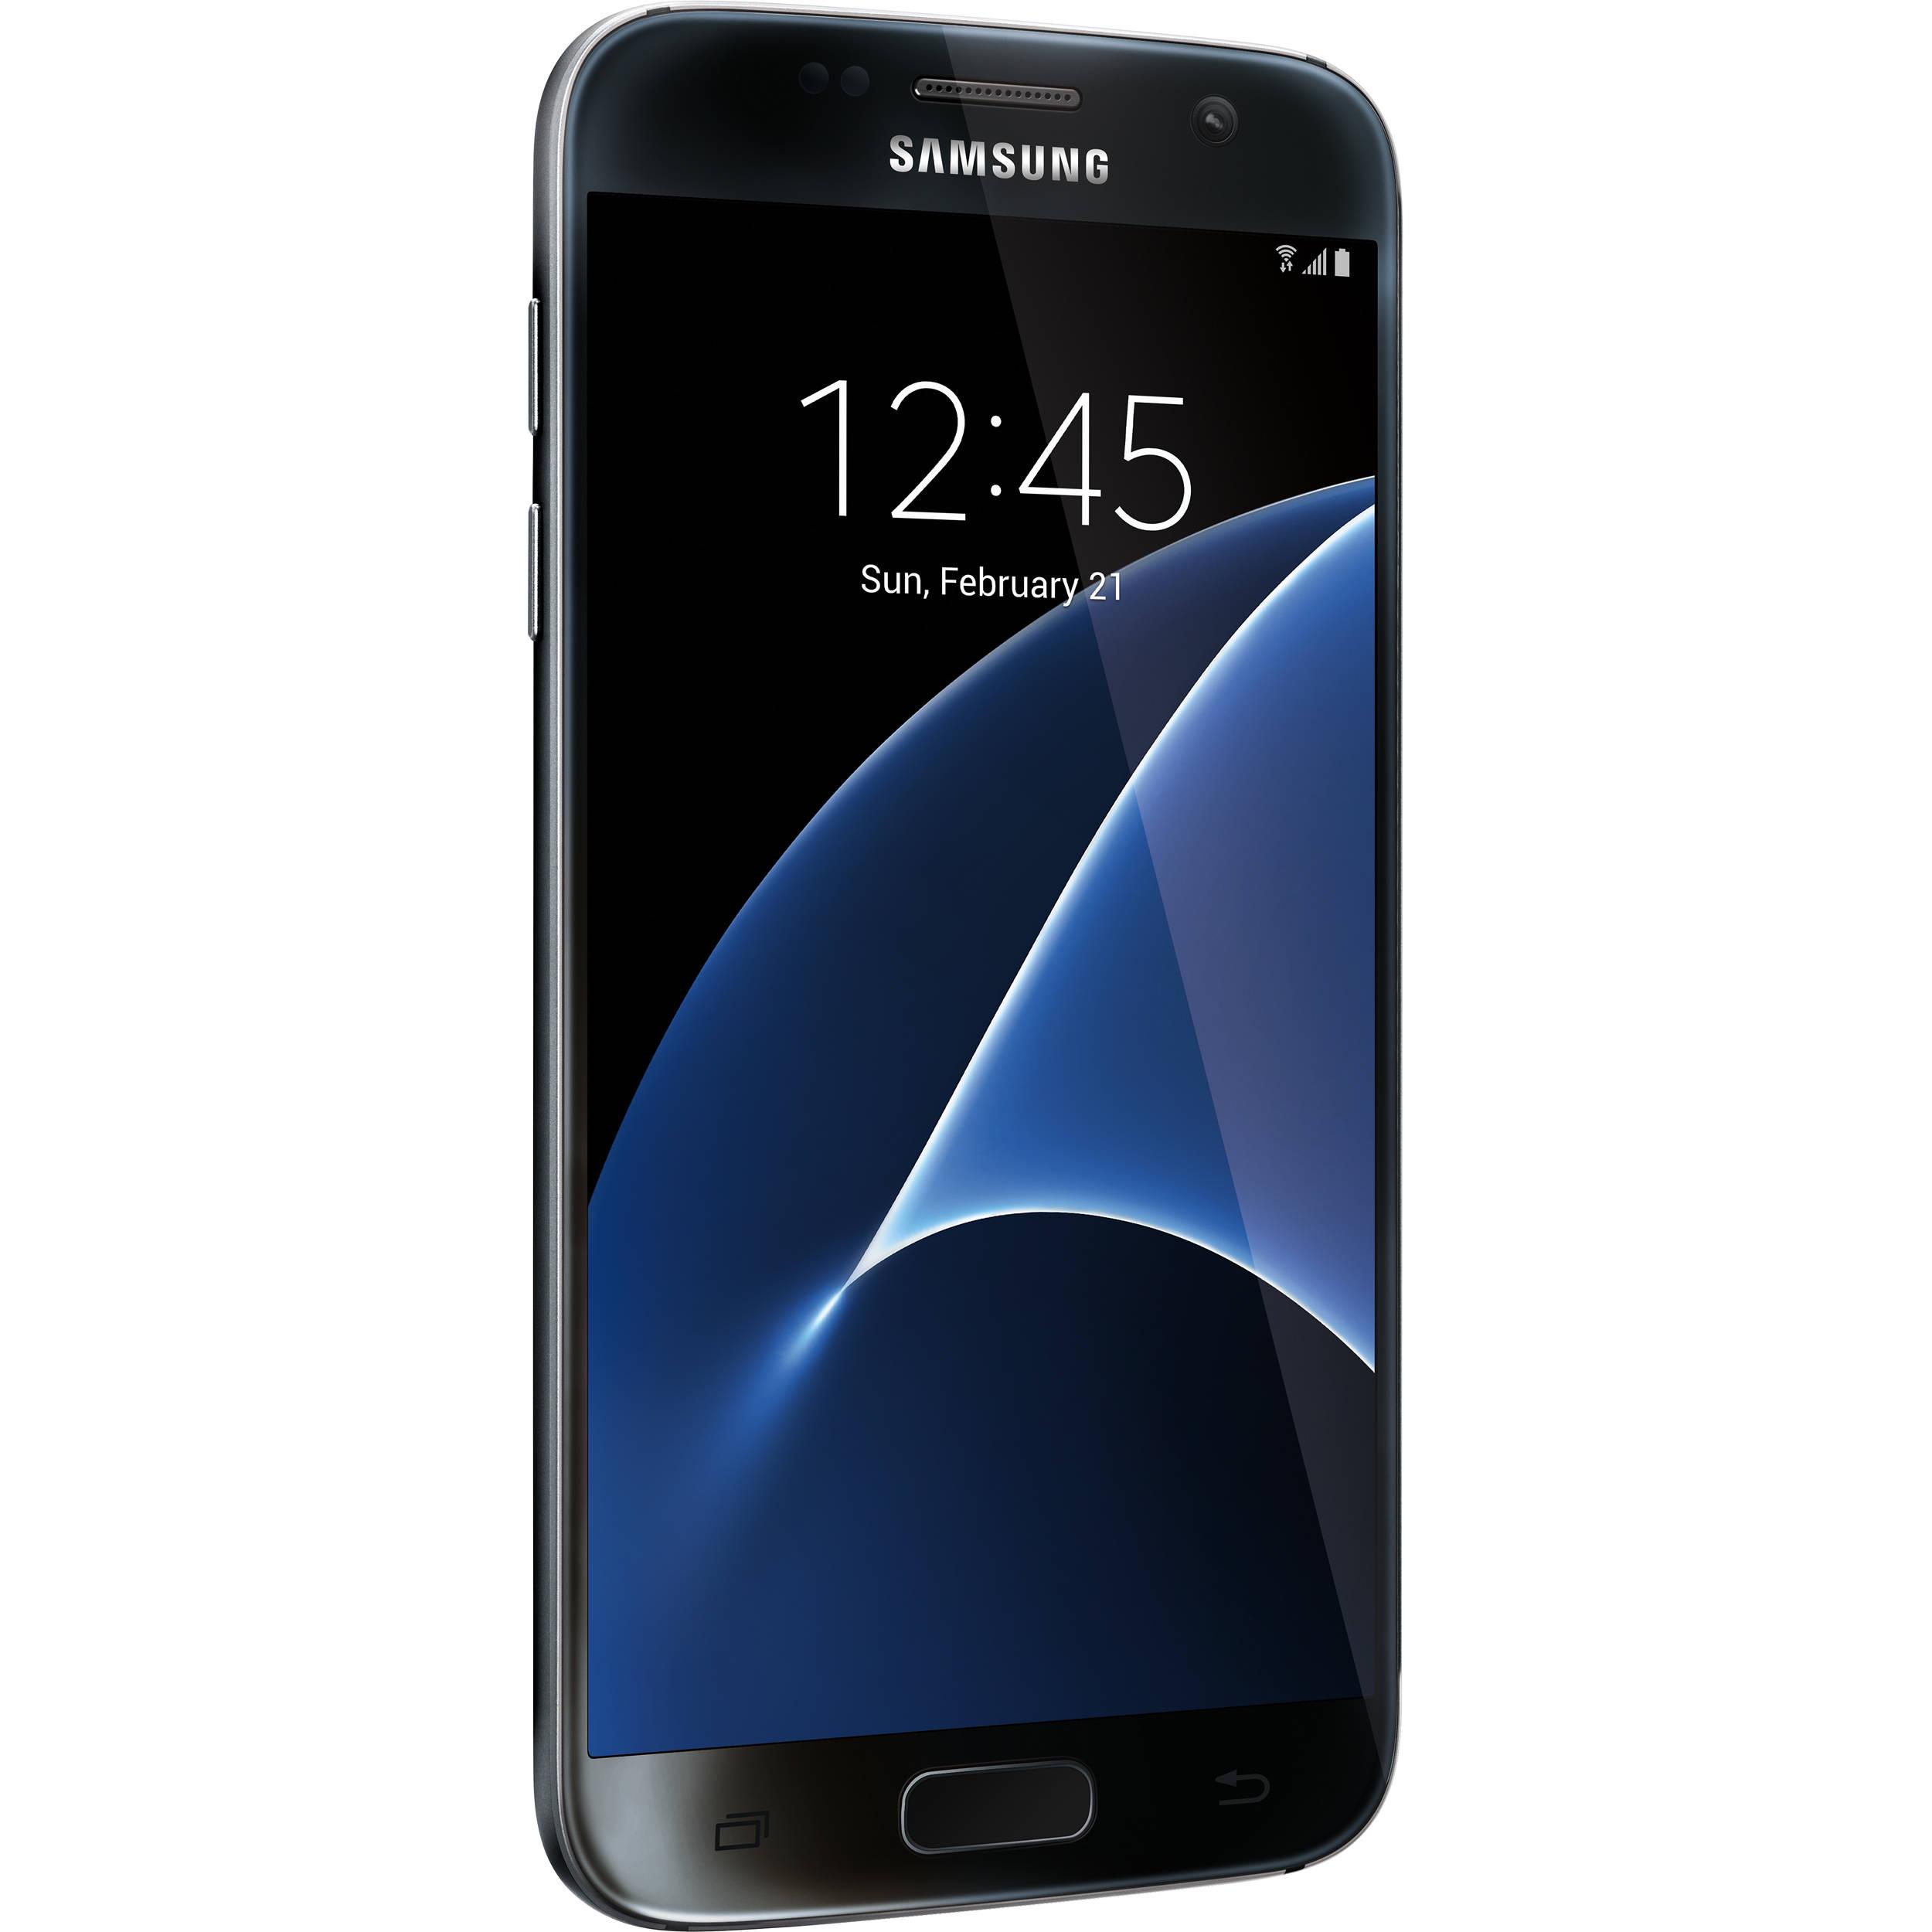 Samsung Galaxy S7 Sm G930u 32gb Smartphone Sm5g930uzkaxaa Bh Iphone 5 Apple Certified Pre Owned Unlocked Black